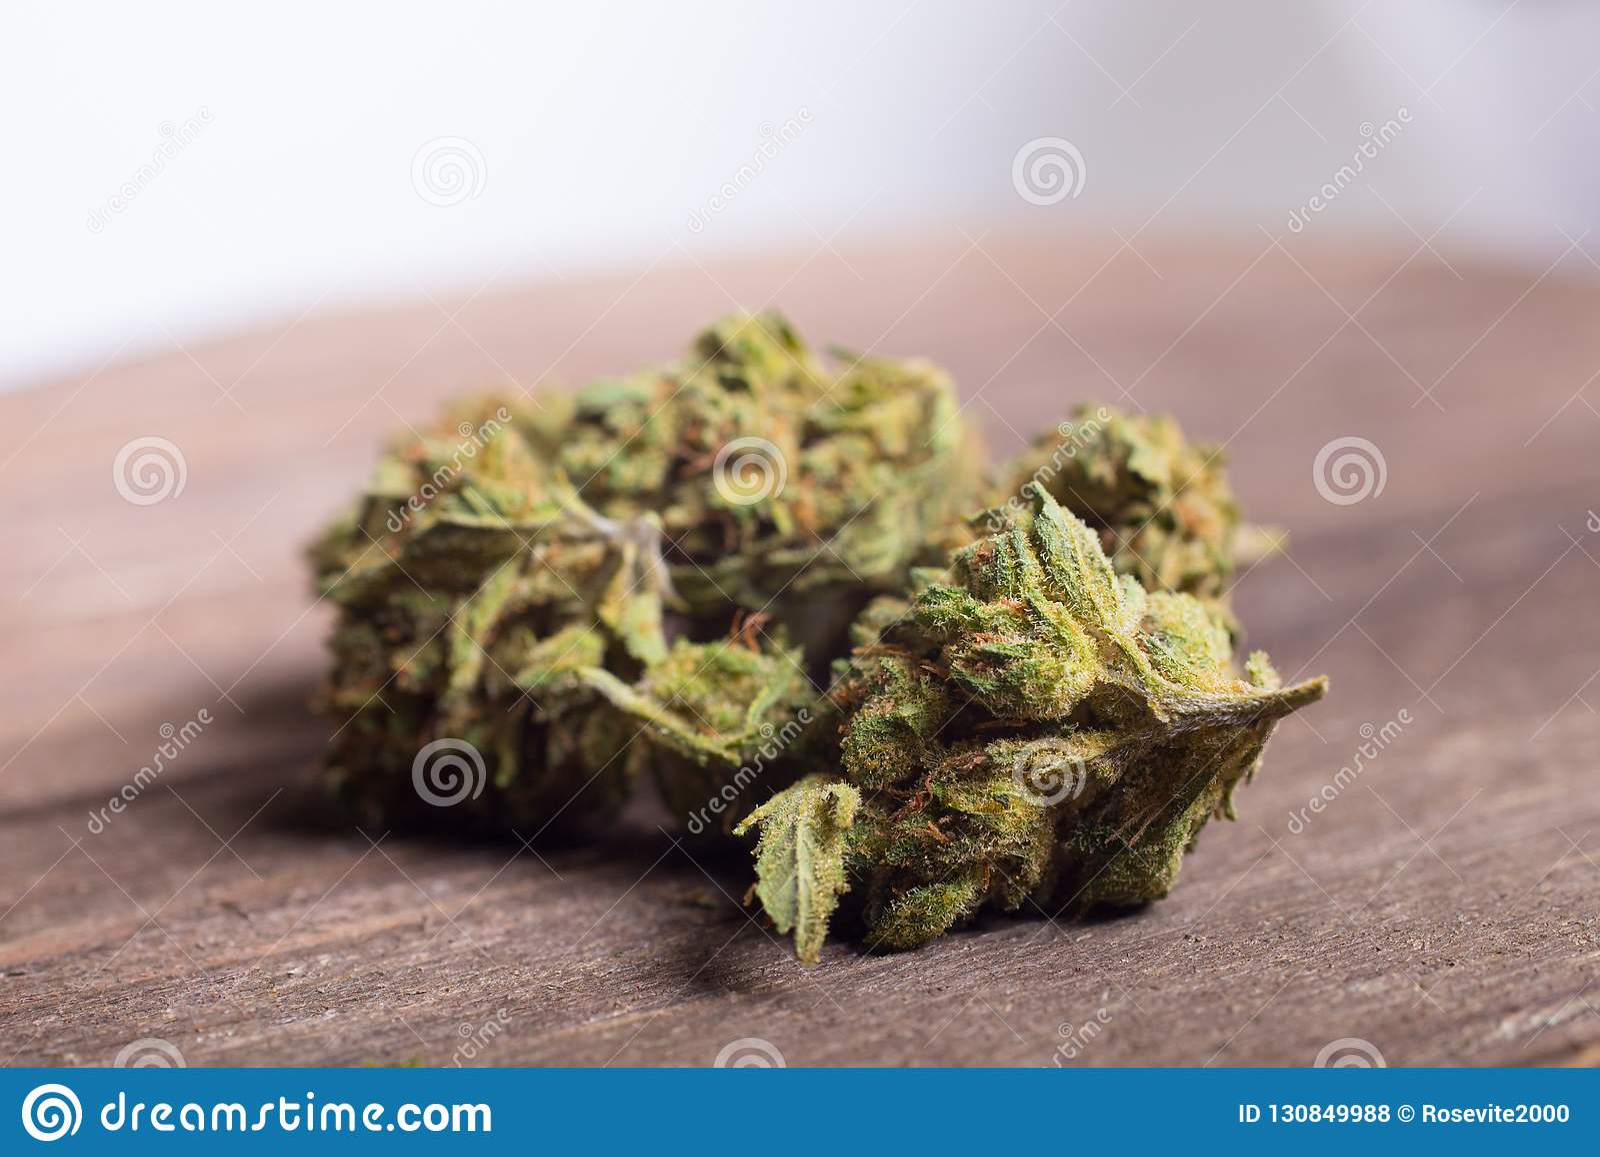 Dried Medical Marijuana 420 Or Cannabis Leaves Stock Photo - Image